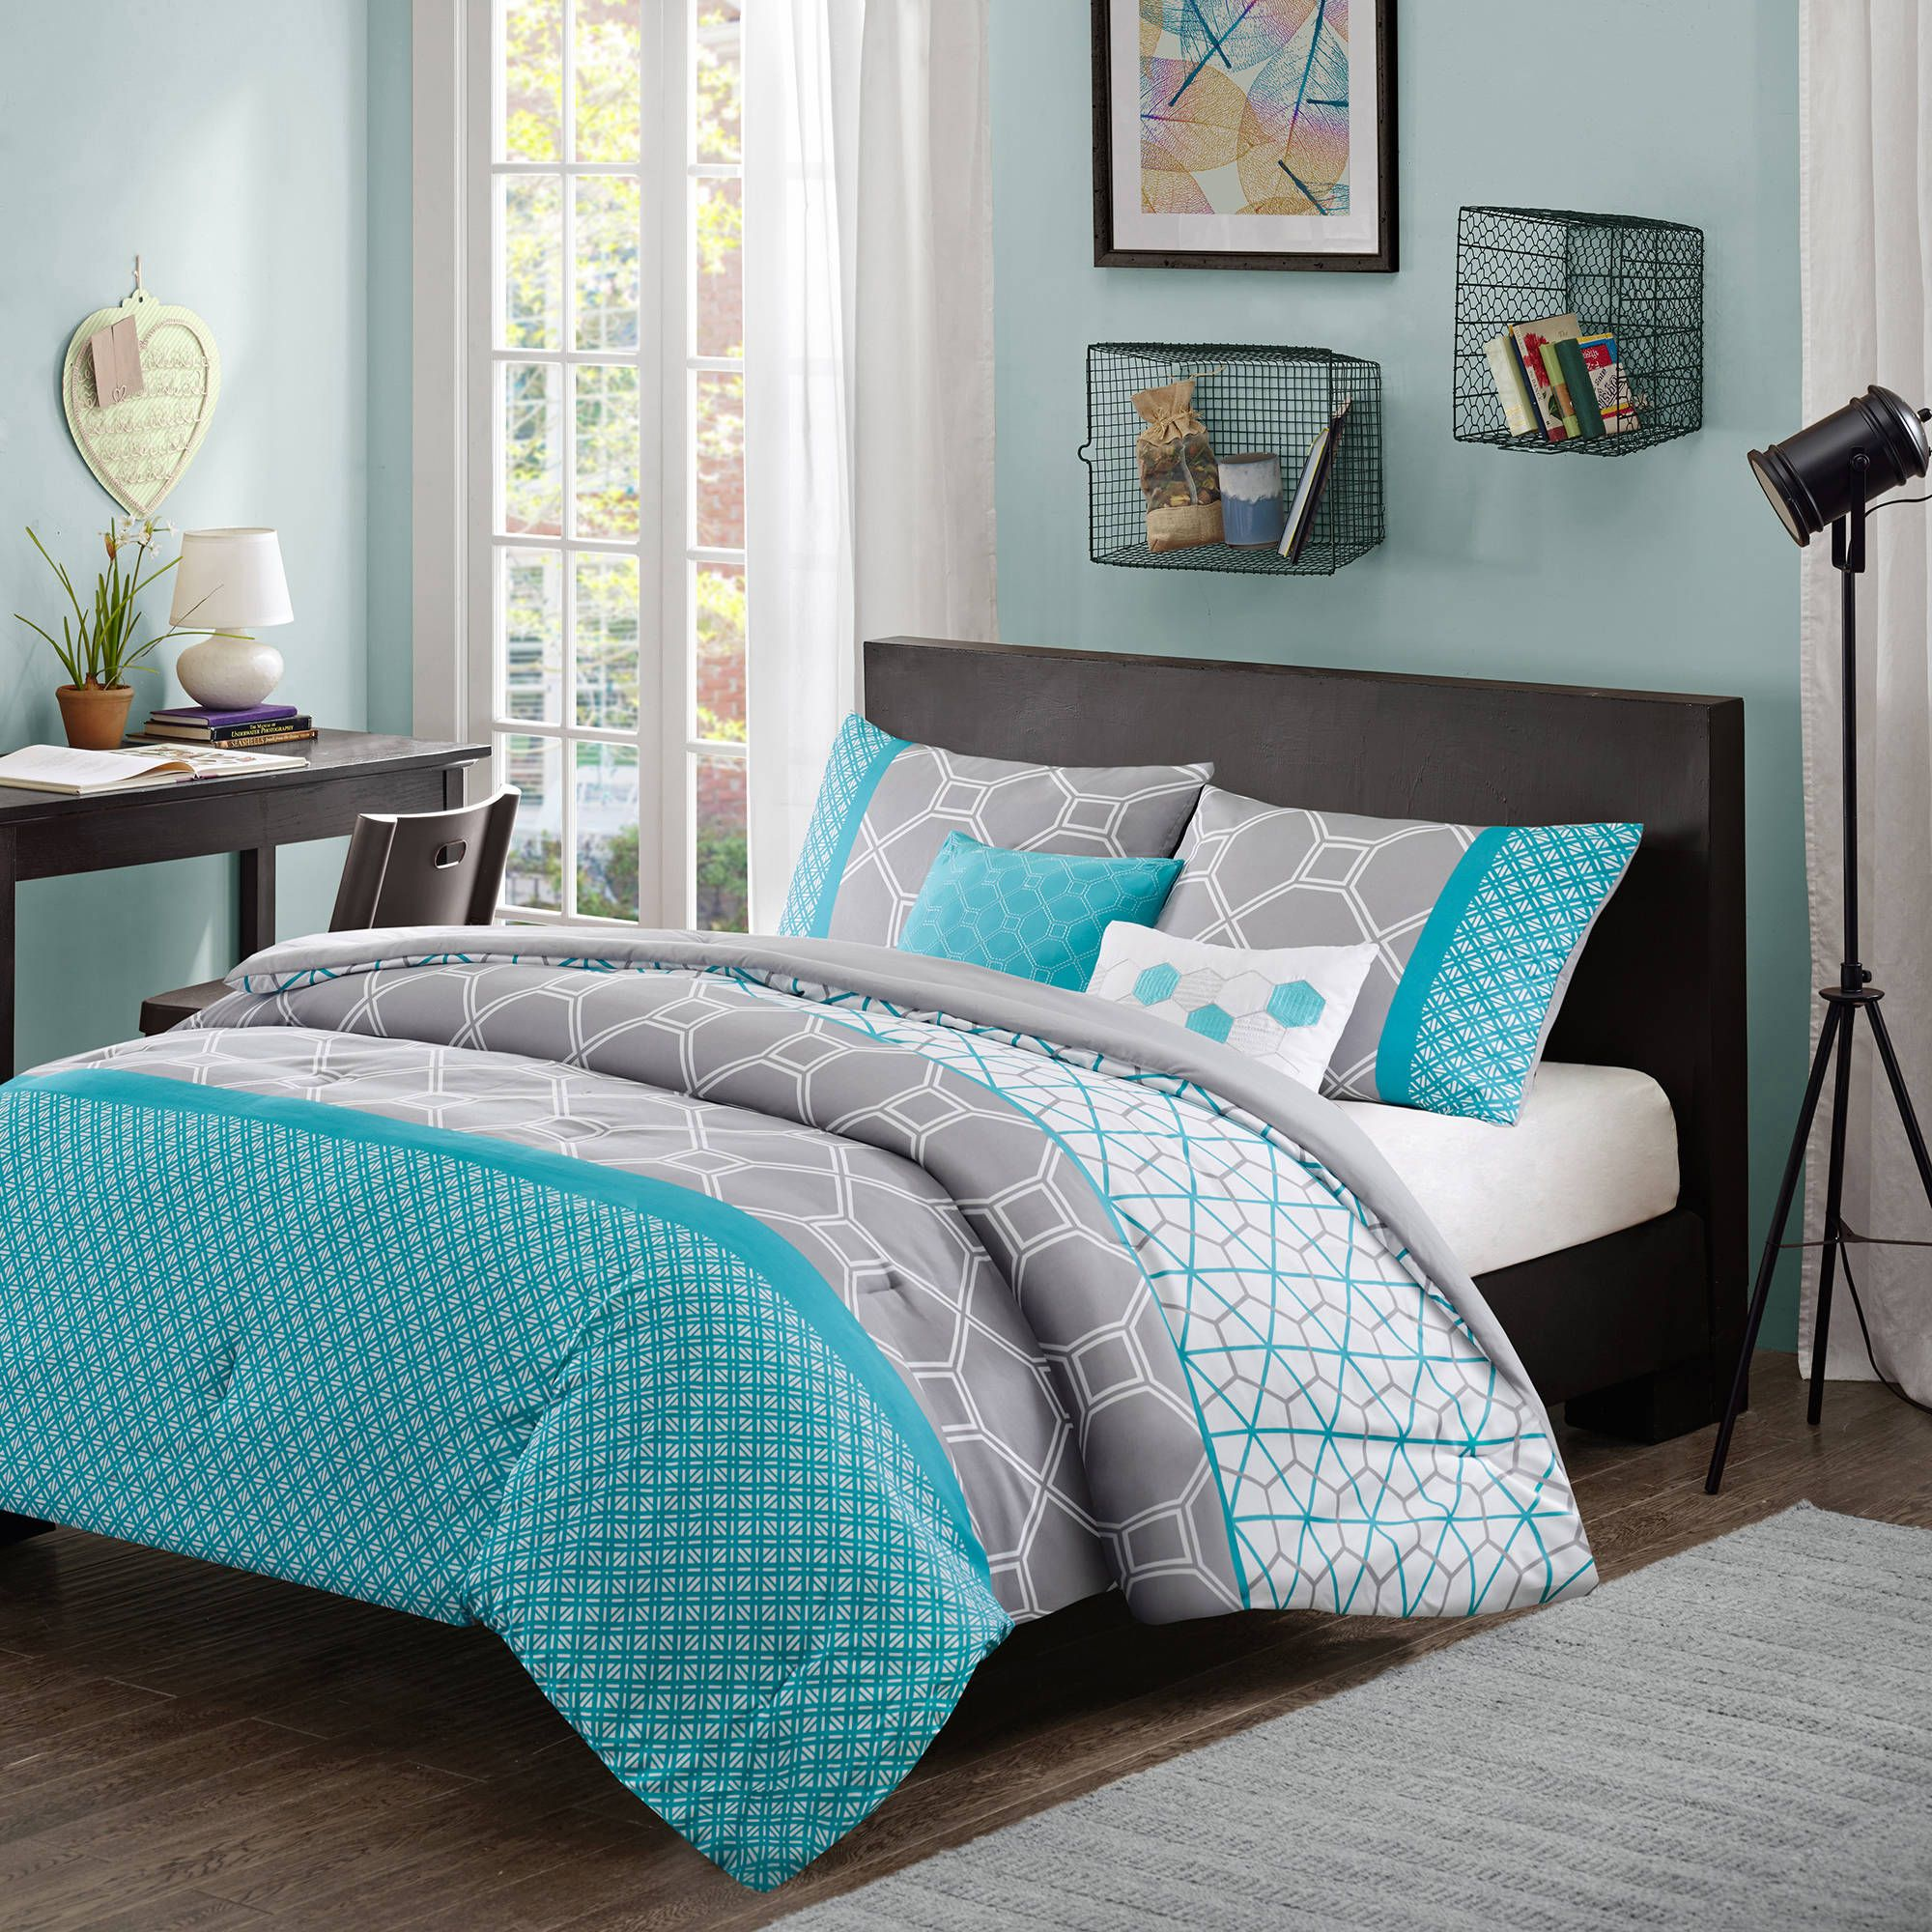 Home Essence Apartment Sarah Bedding forter Set